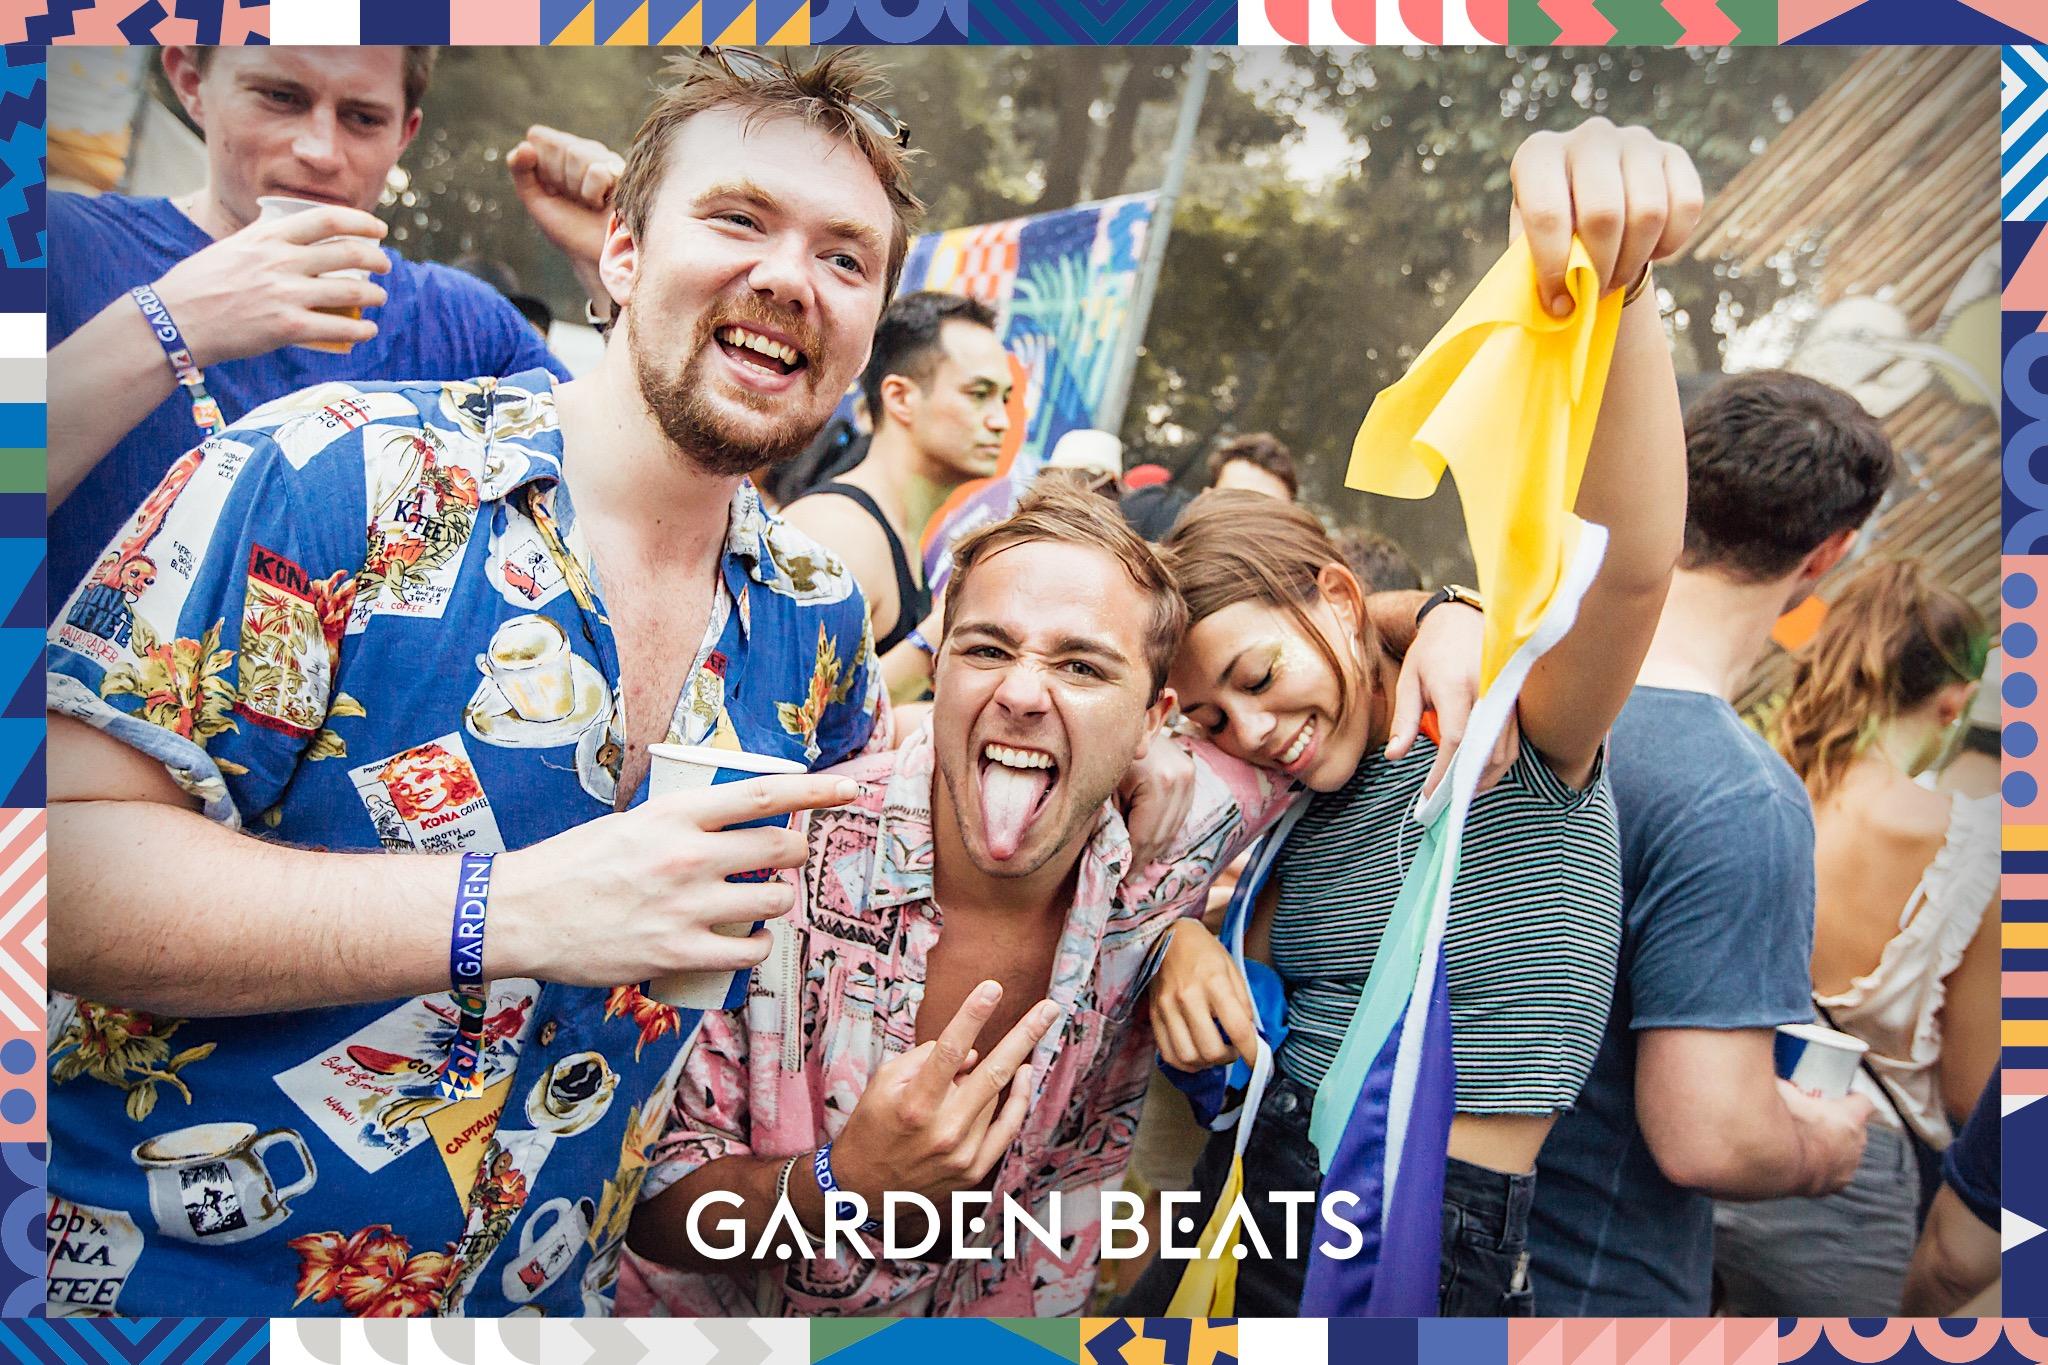 18032017_GardenBeats_Colossal677_WatermarkedGB.jpg